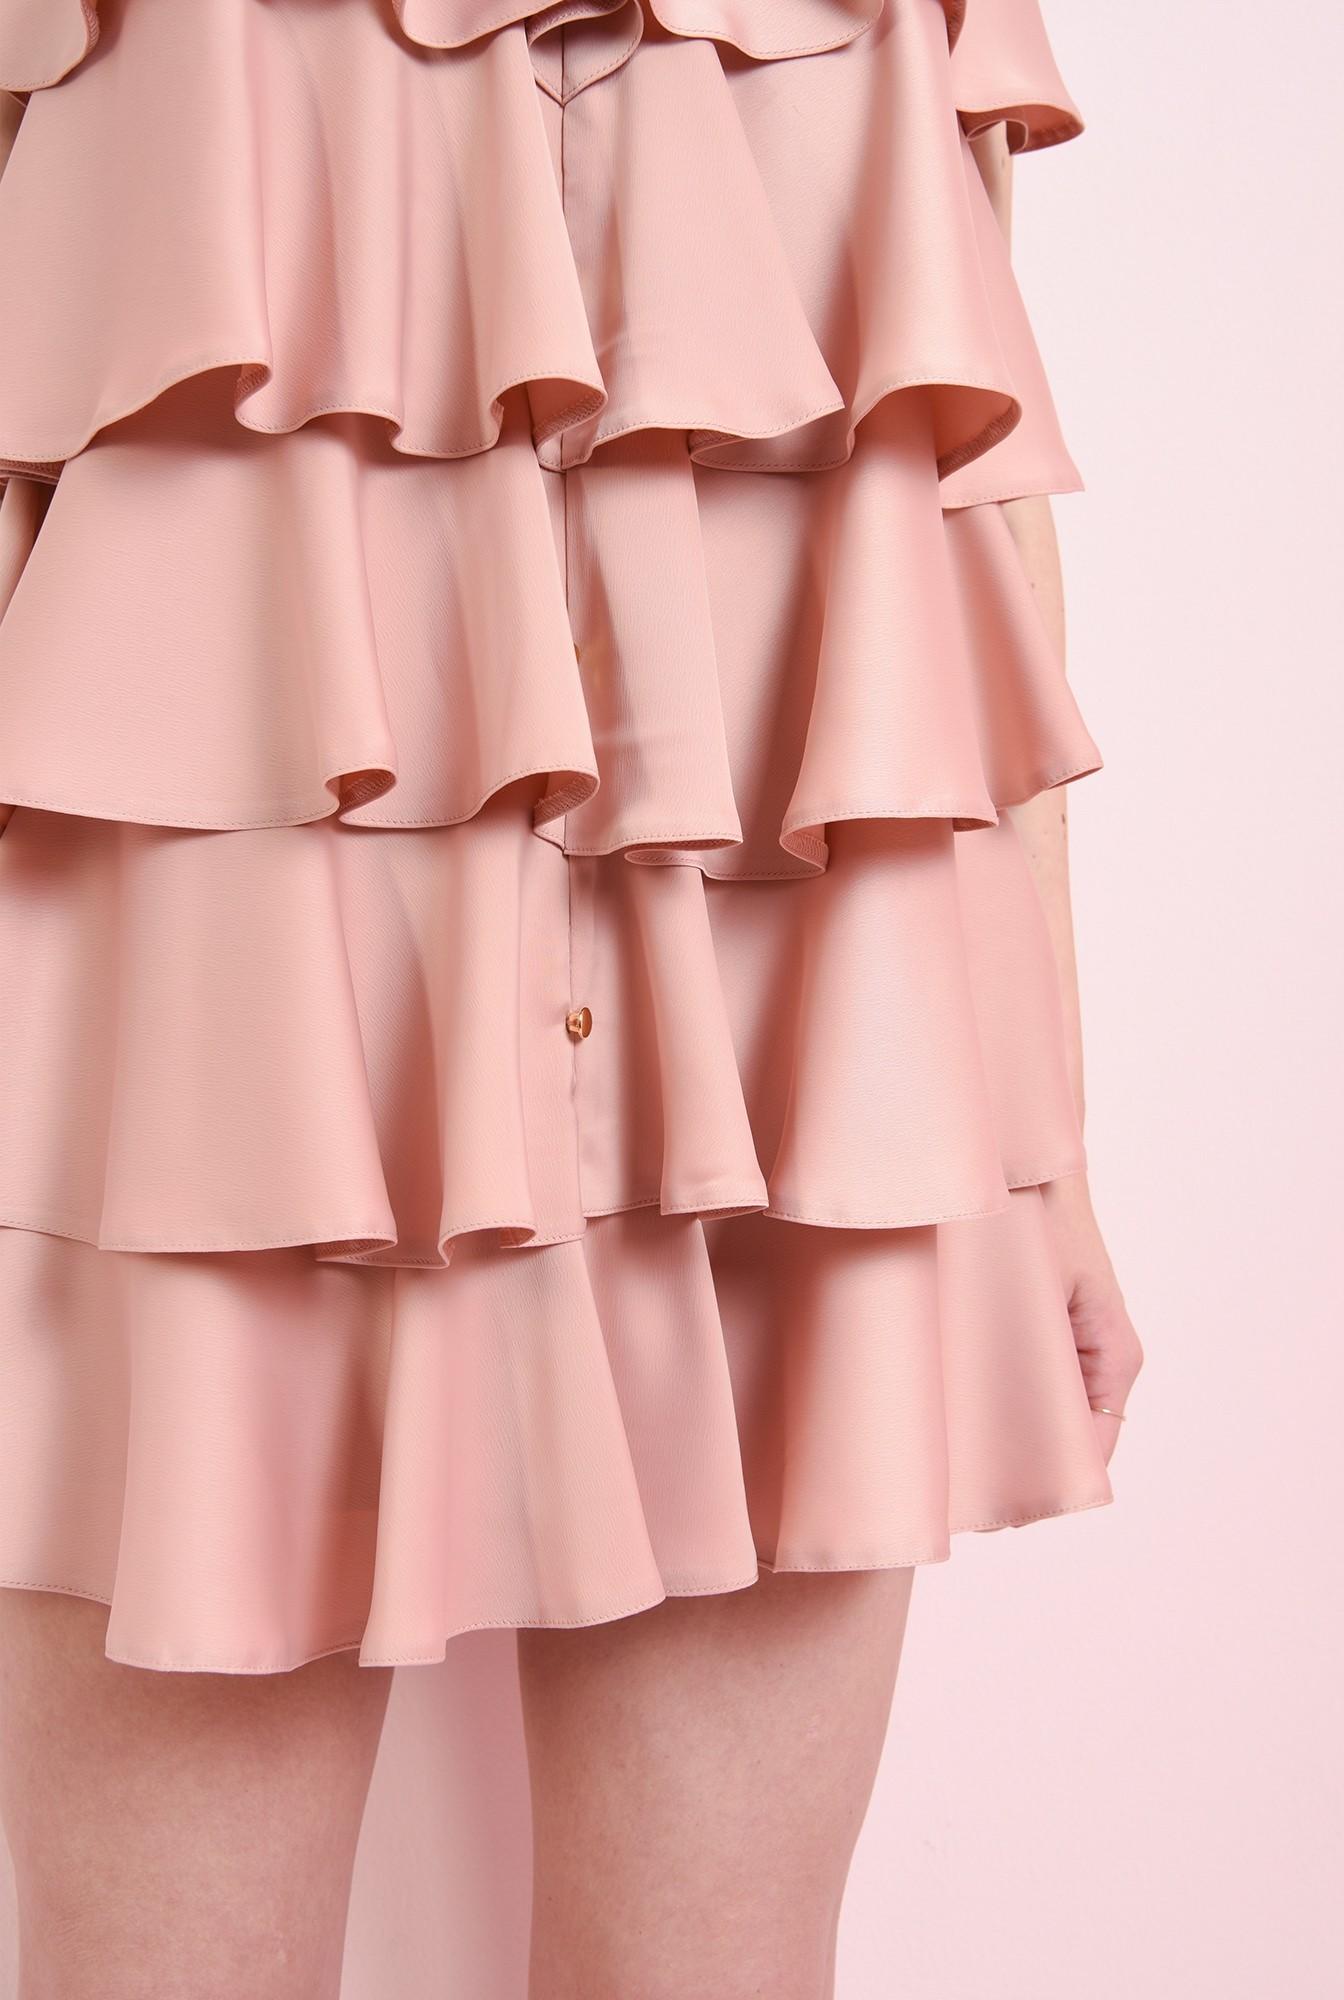 2 - rochie roz pastel, cu volane suprapuse